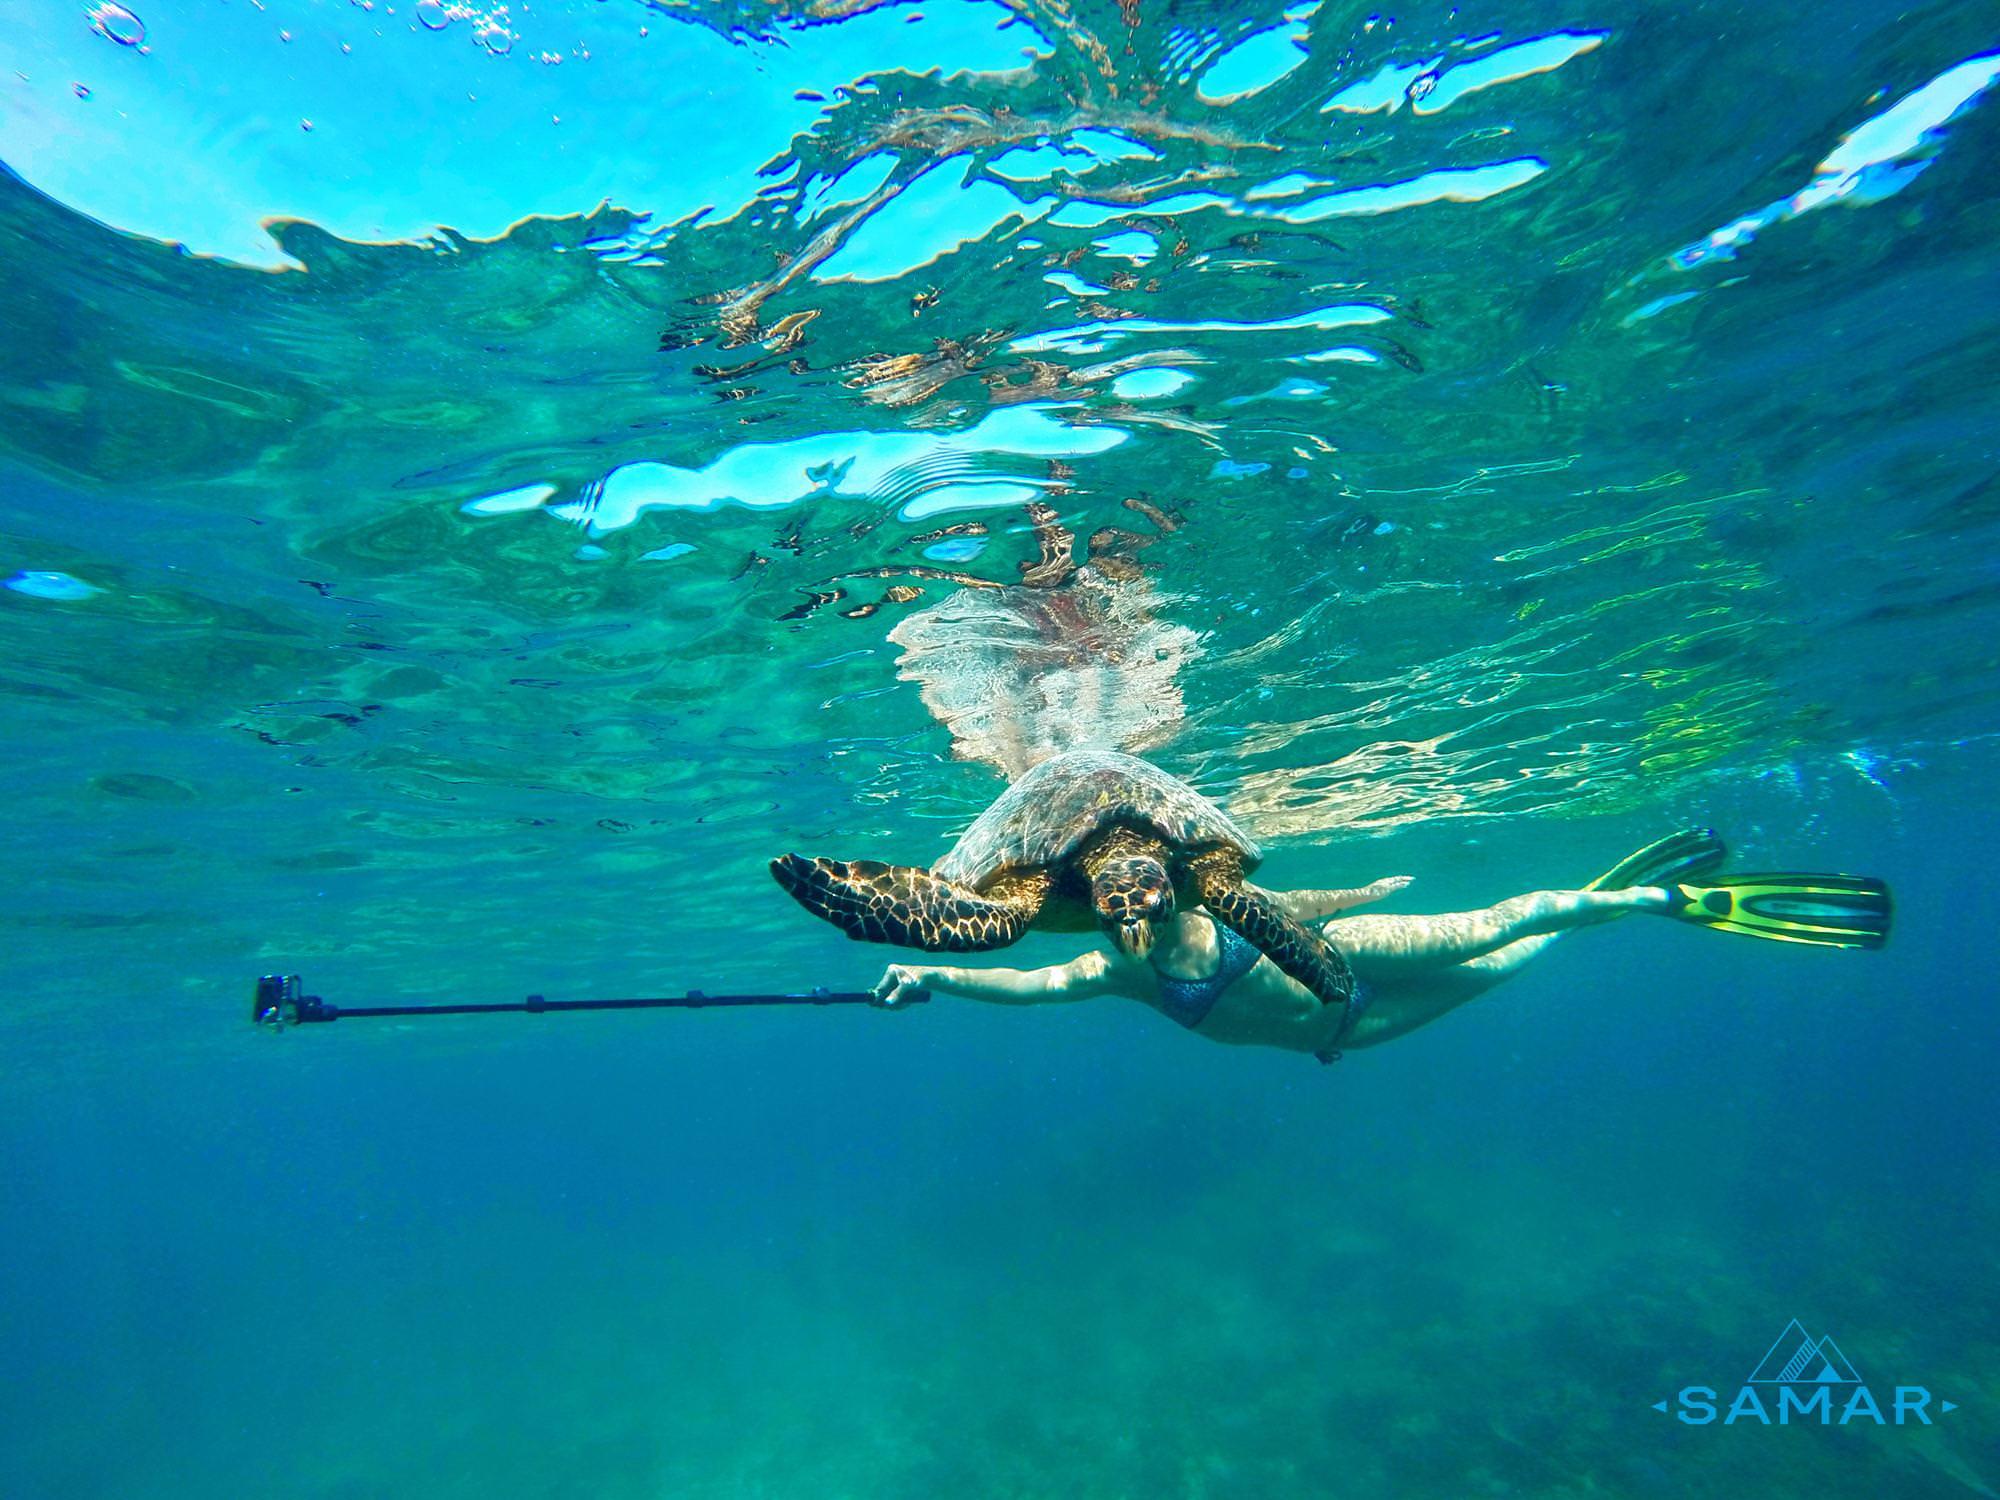 Встретили черепаху в воде